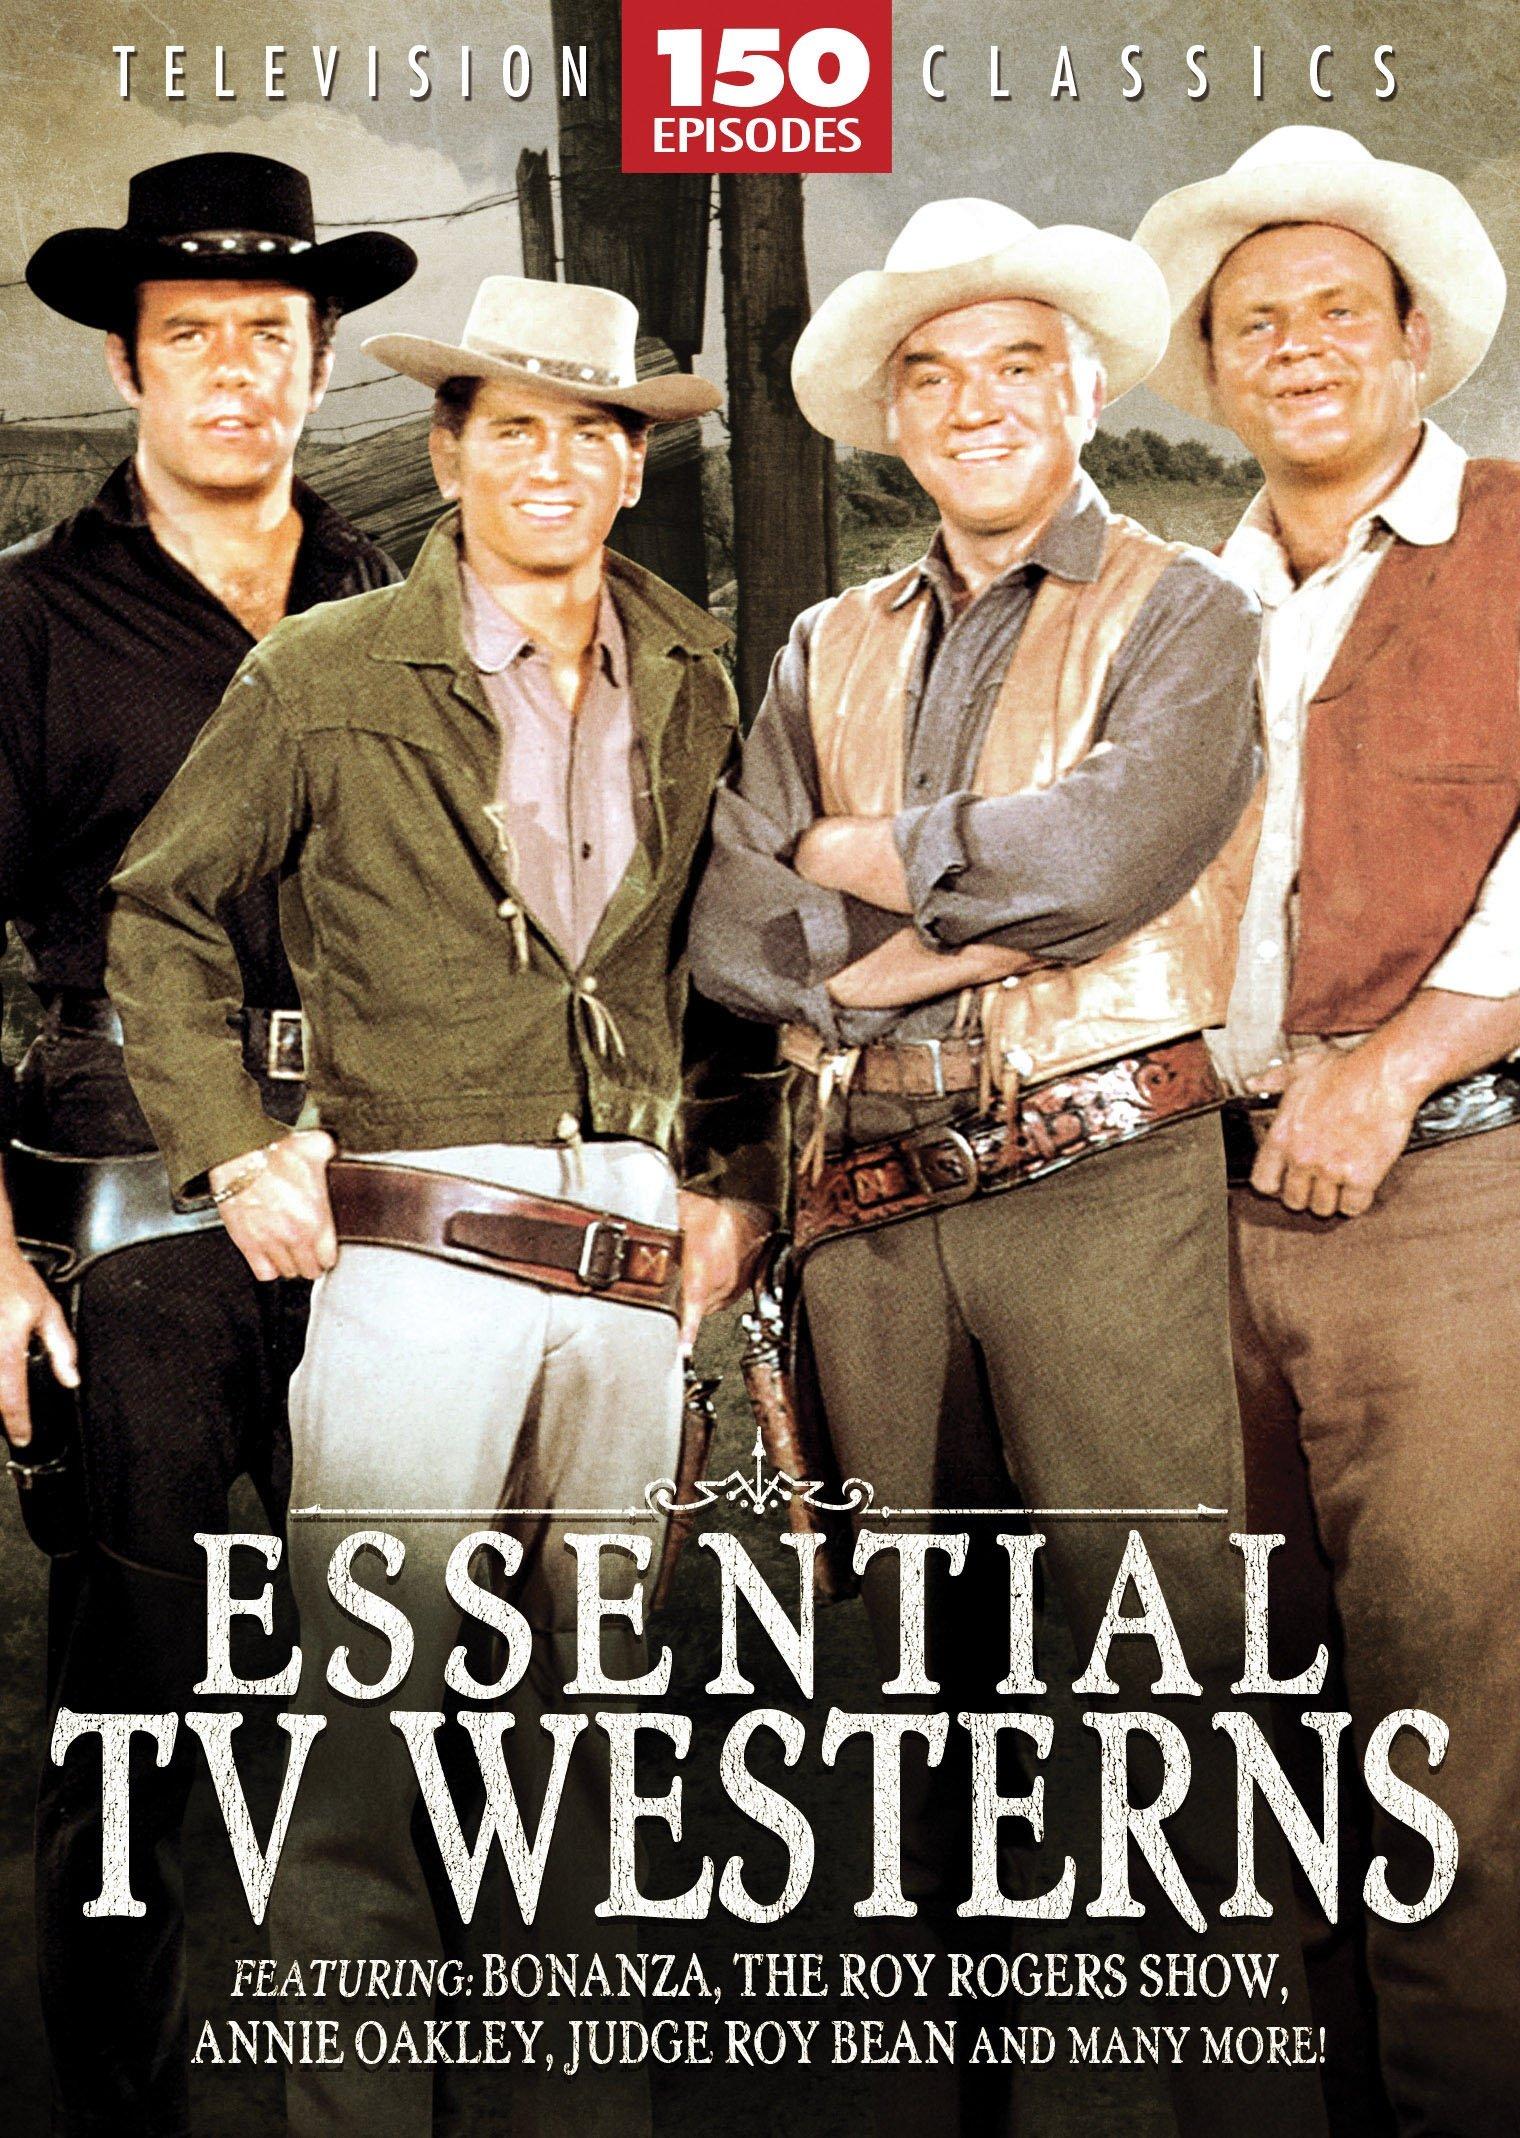 Essential TV Western - 150 Episodes: Bonanza - The Roy Rogers Show - Annie Oakley - Judge Roy Bean - Rango - Kit Carson - Jim Bowie - Gabby Hayes - Range Rider